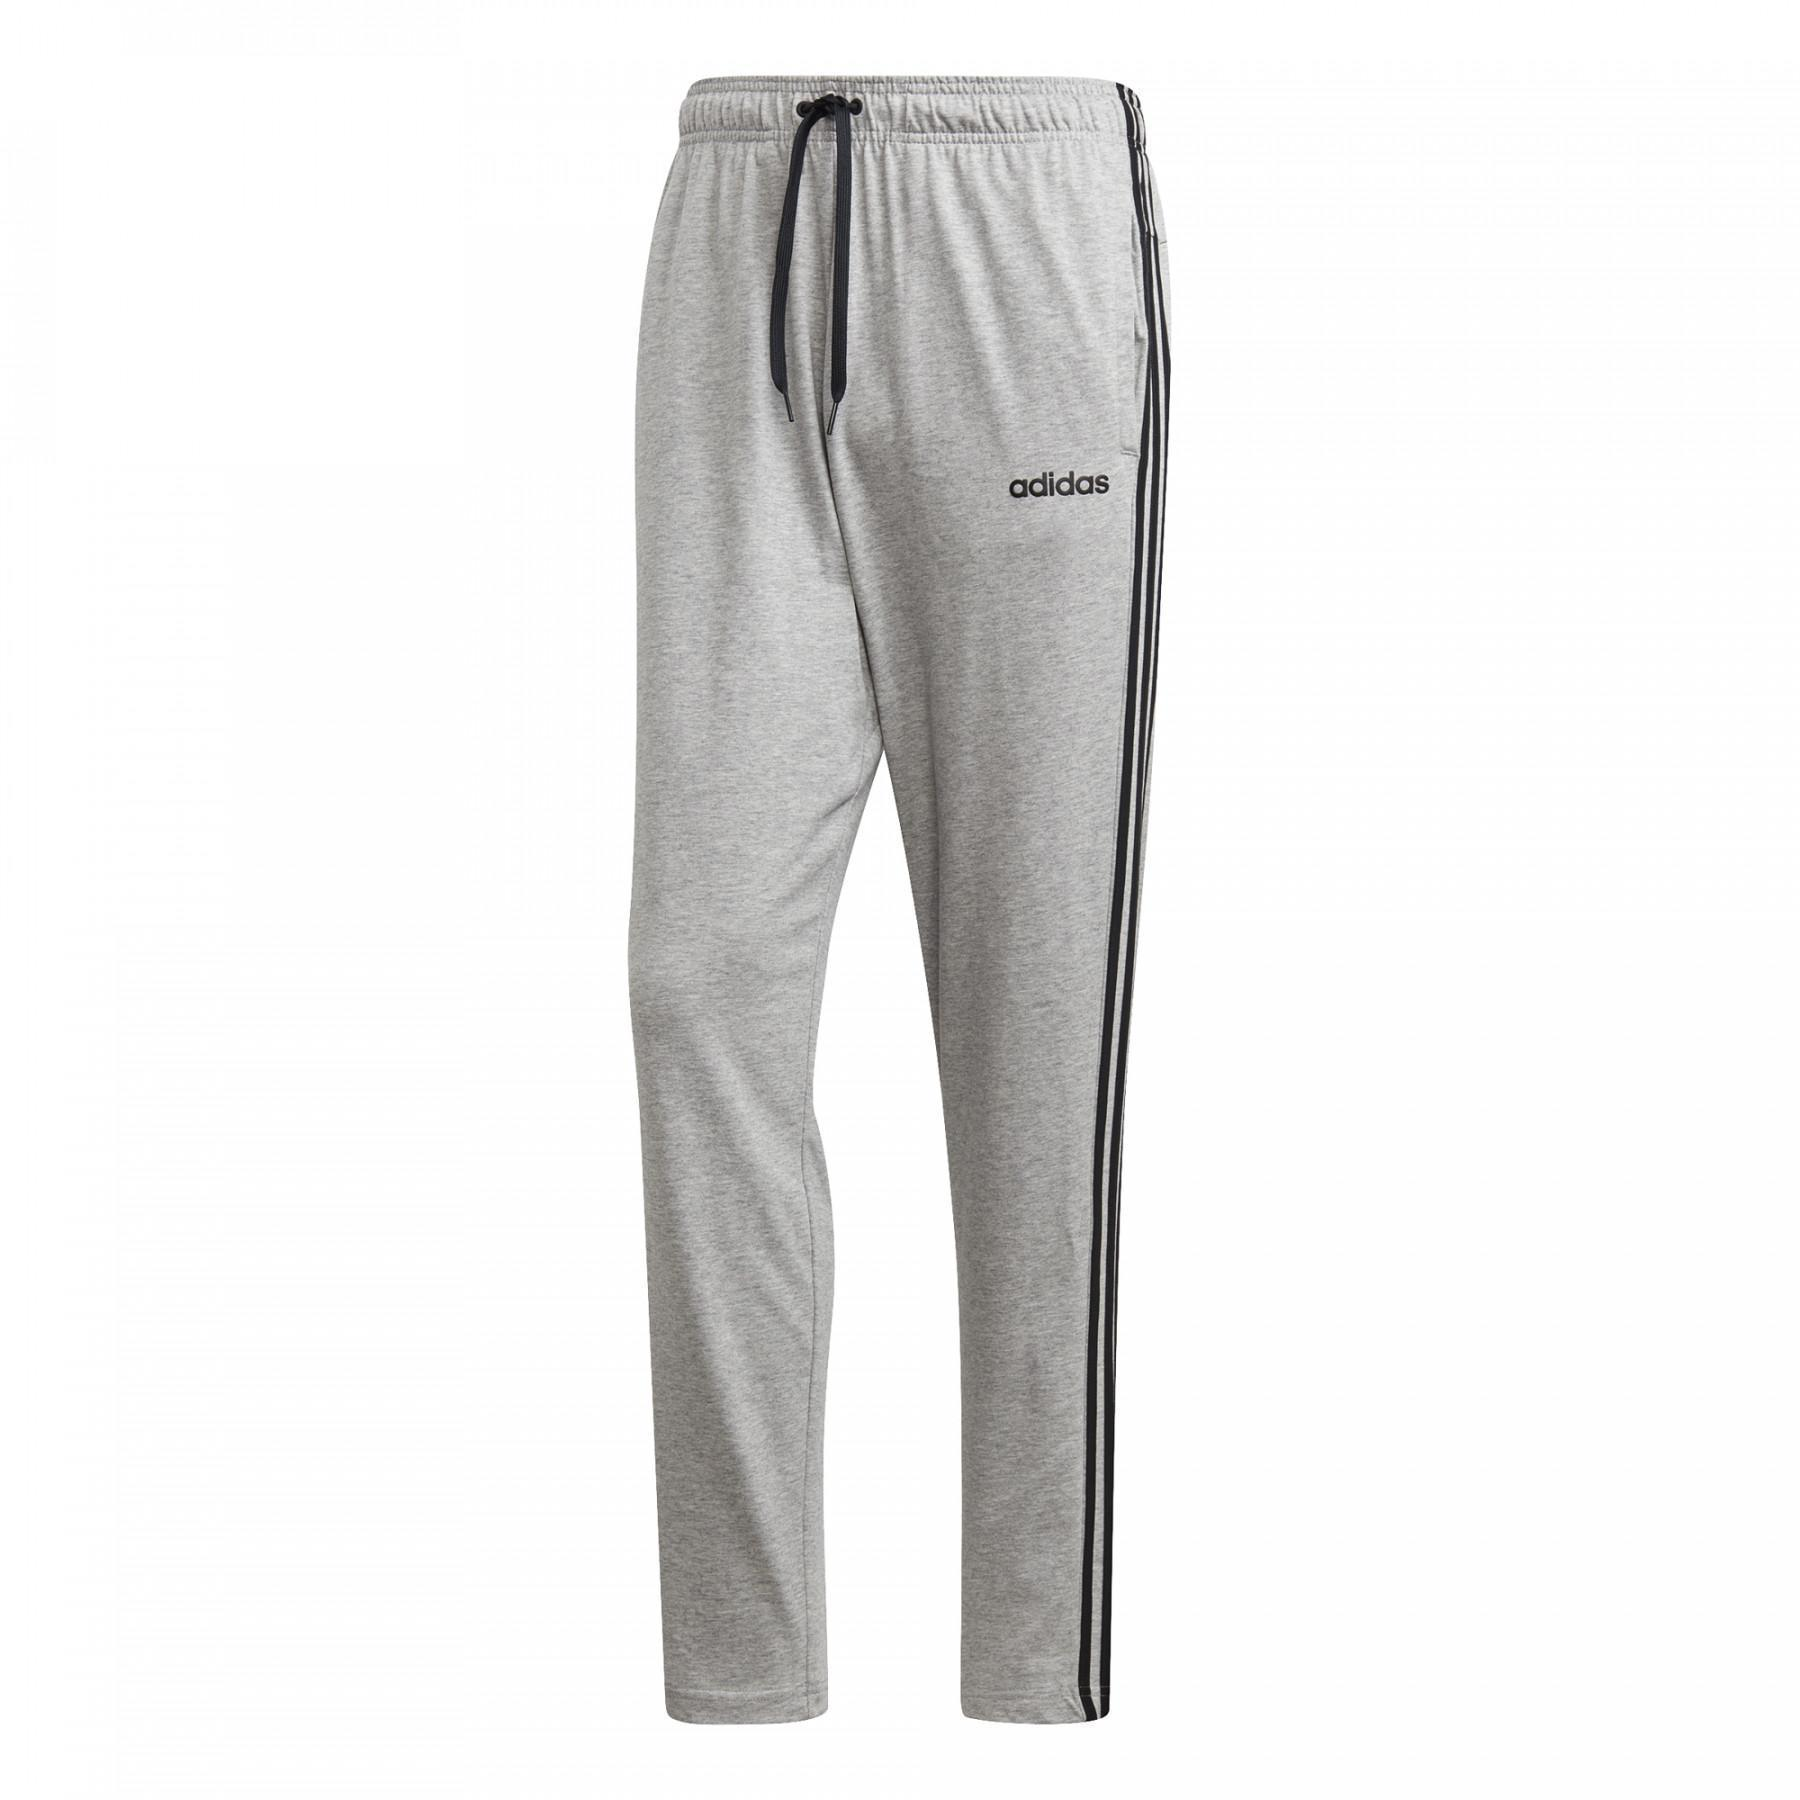 Arte sílaba padre  Pantalon adidas Essentials 3-Stripes Tapered Open Hem